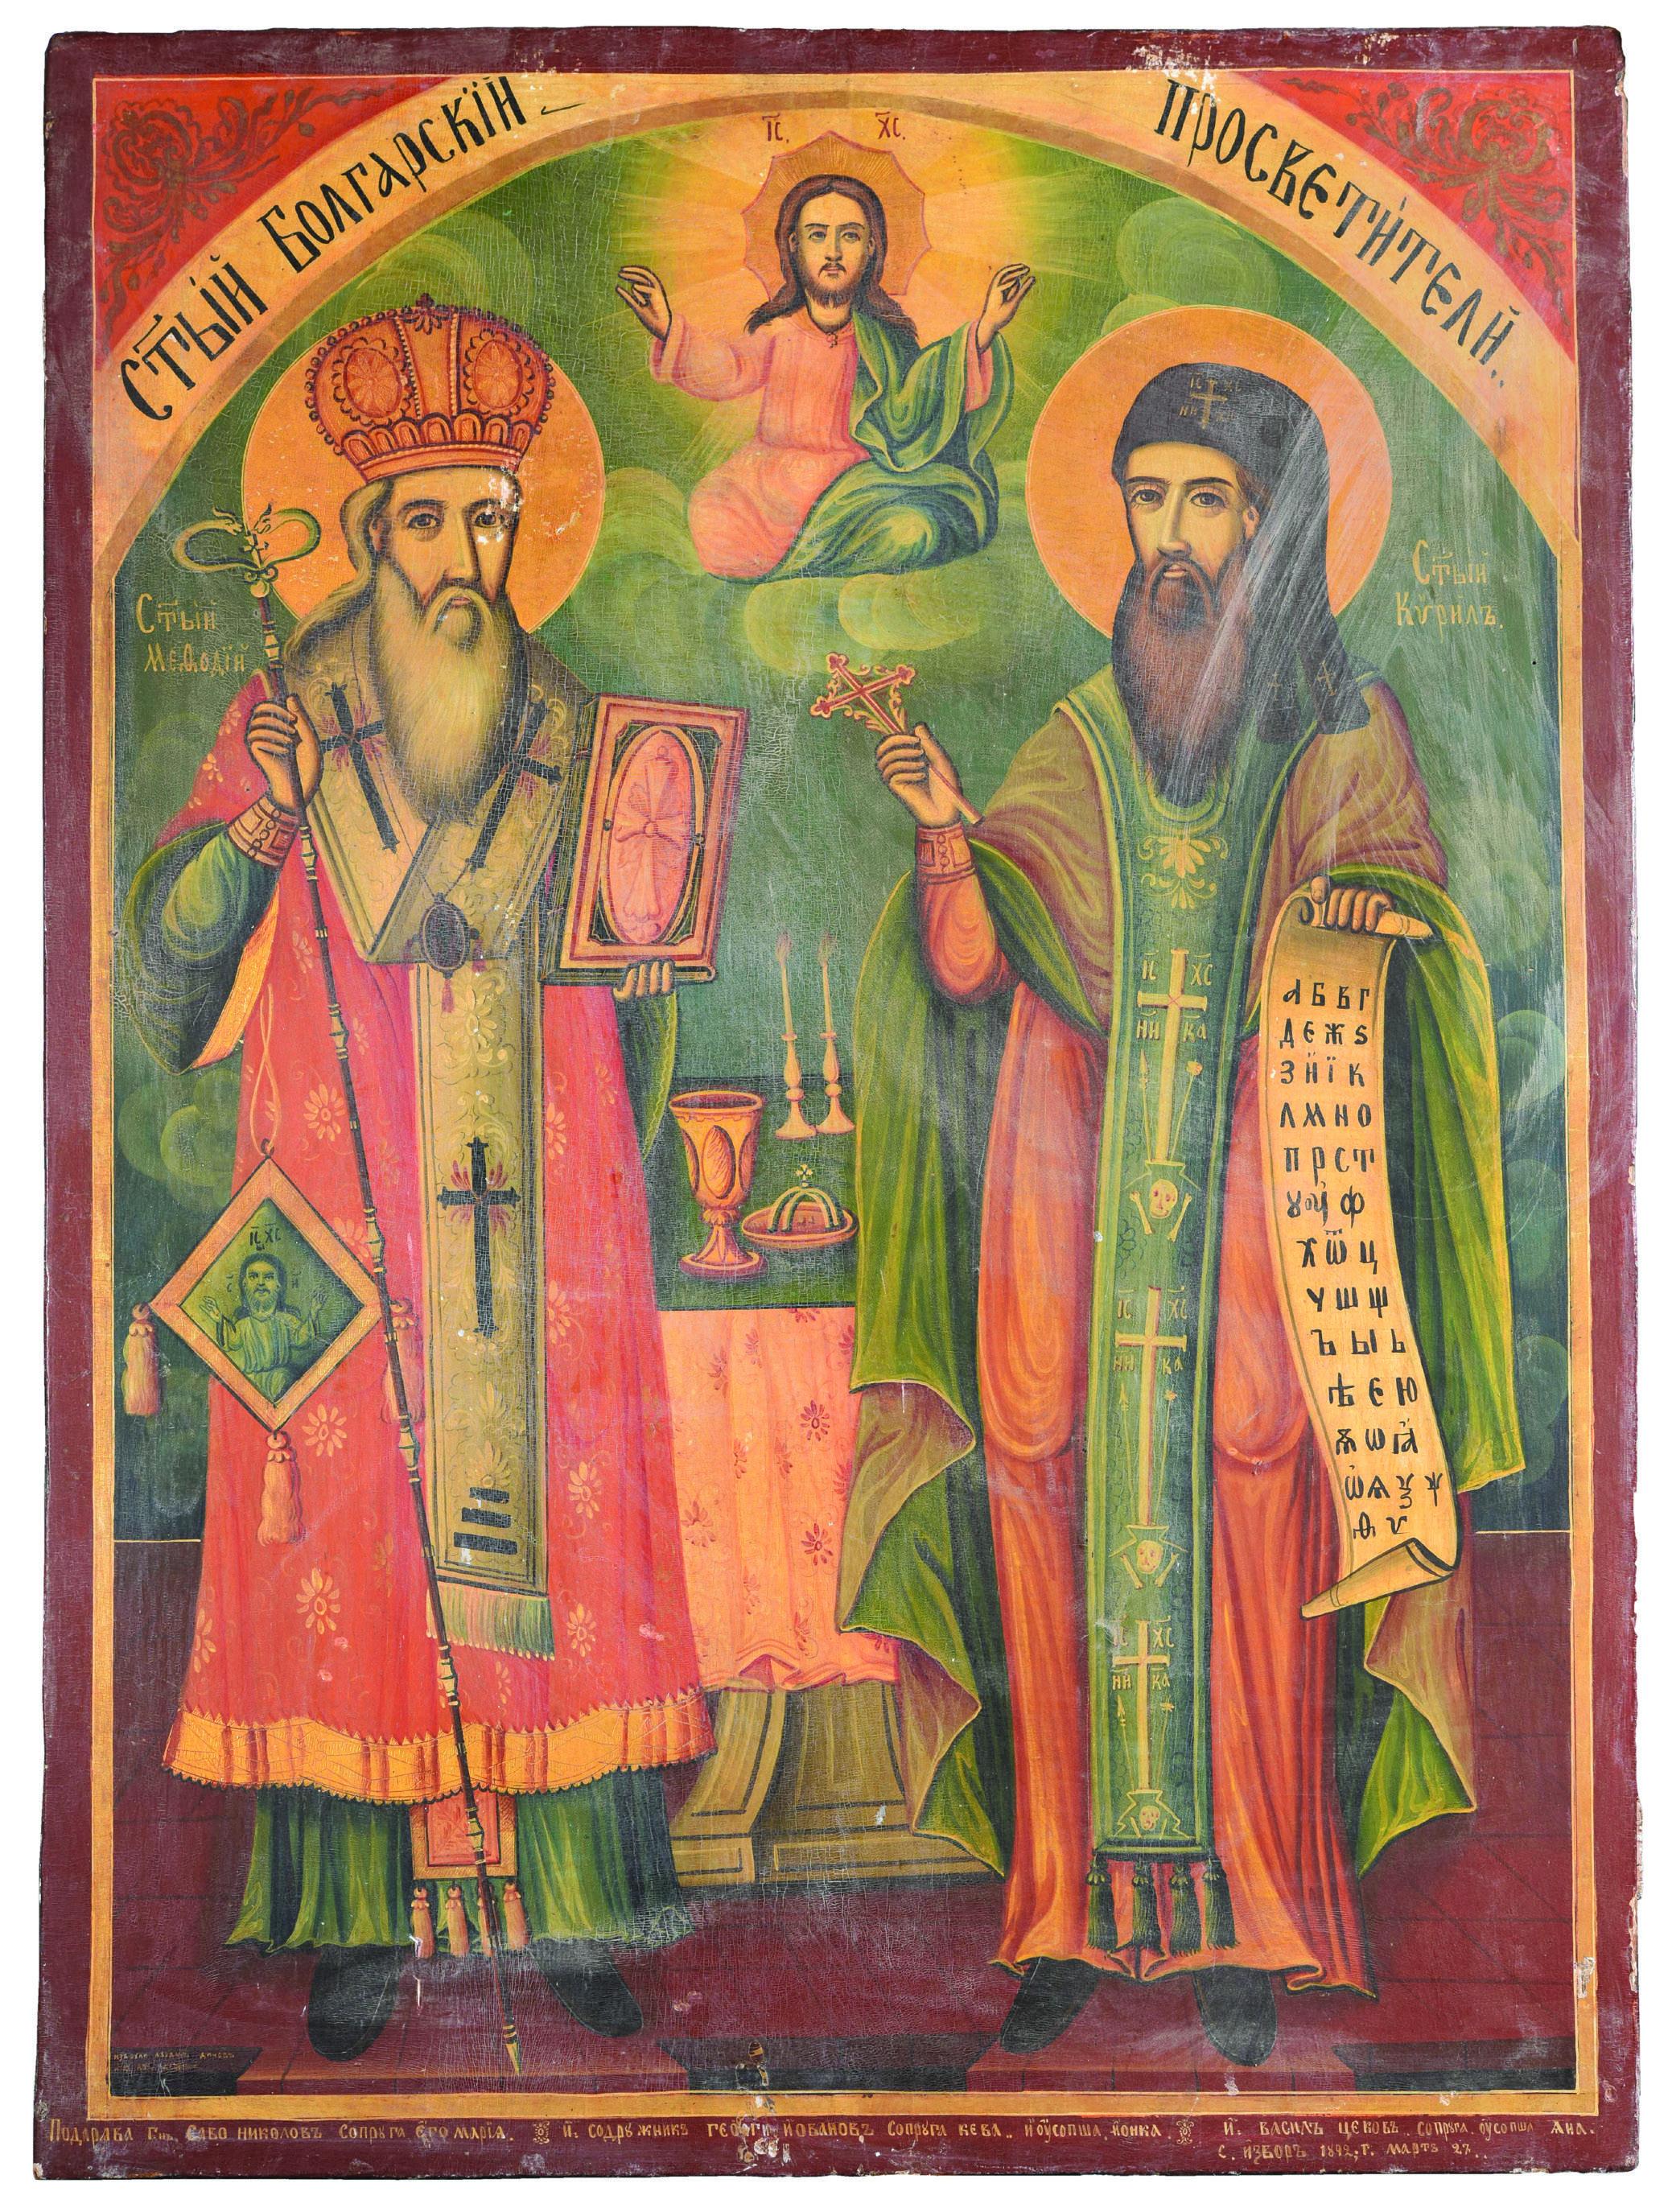 Saints_Cyril_and_Methodius_Bulgarian_Enlighteners_Icon_by_Avram_Dichov,_1892